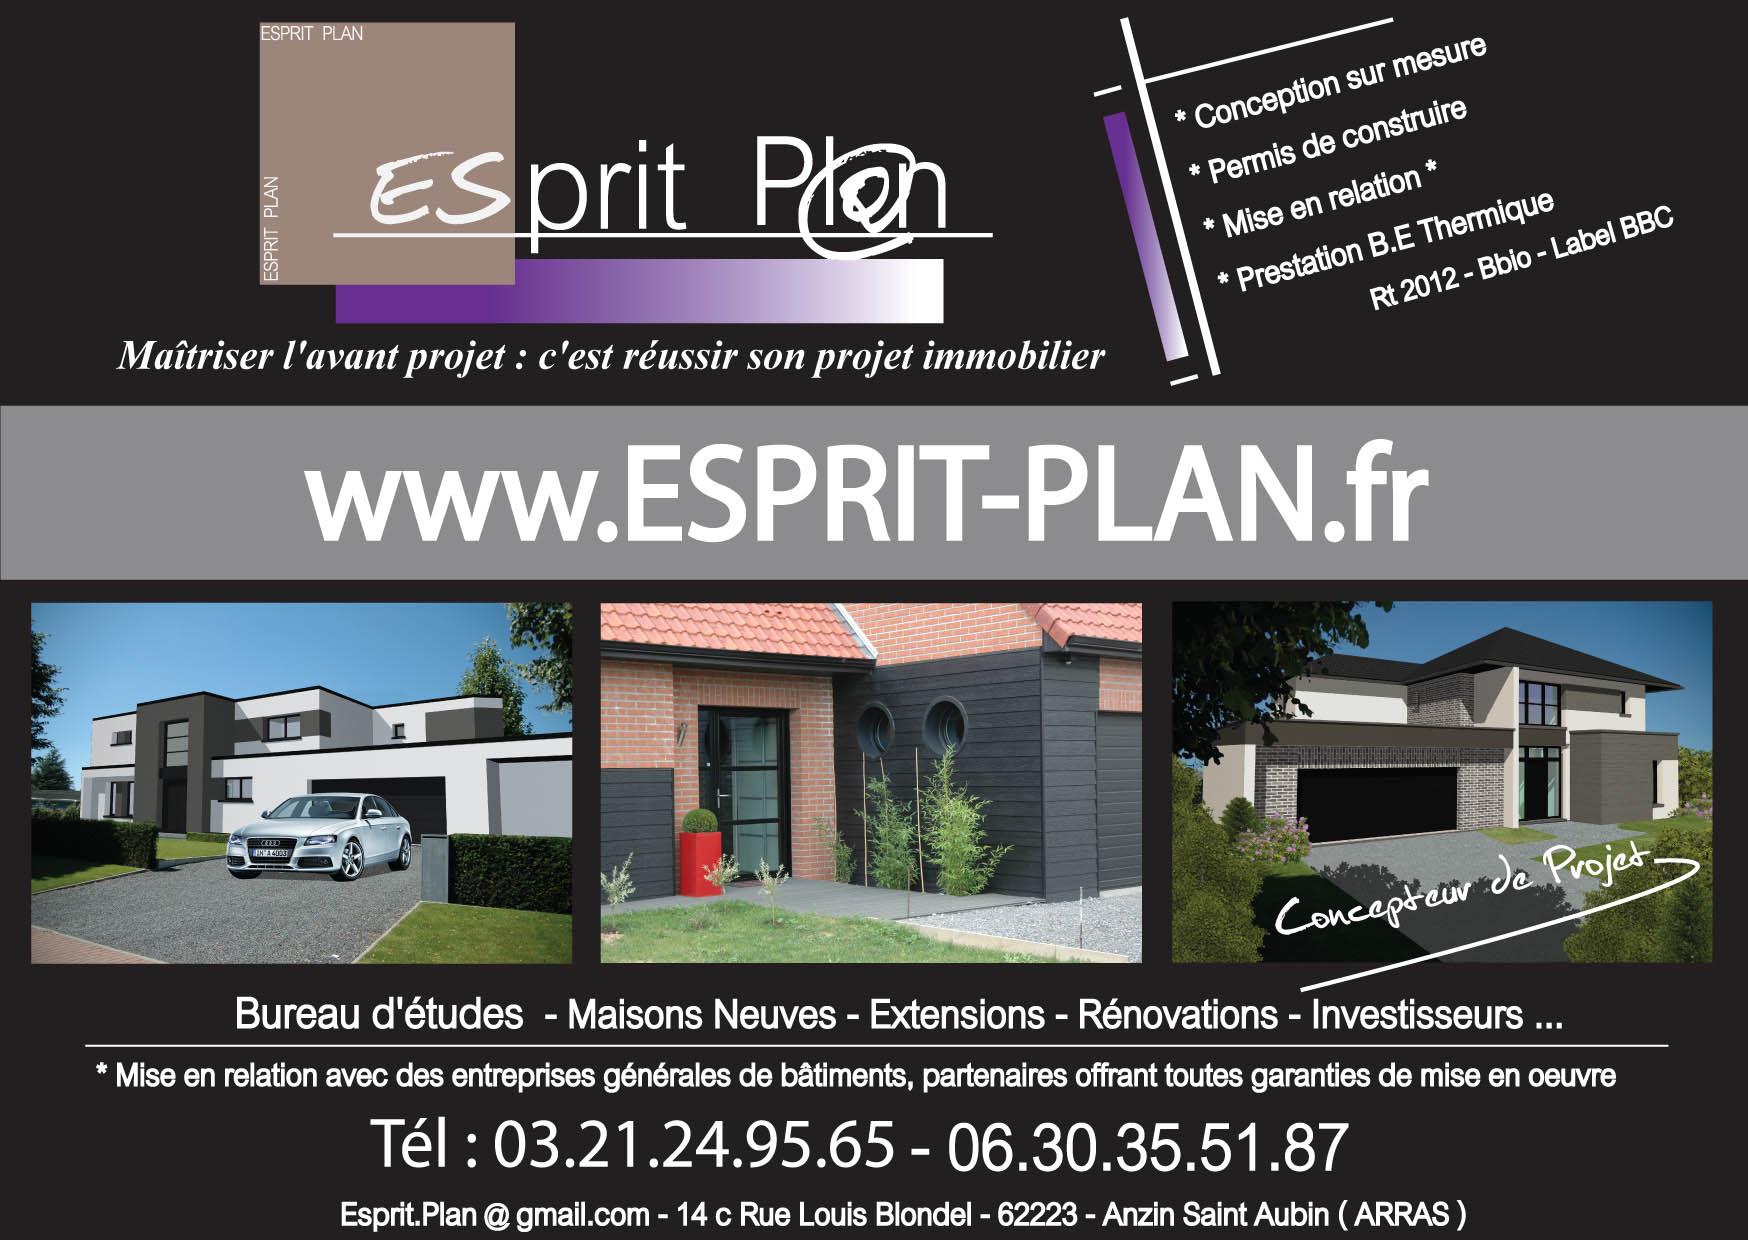 Esprit Plan Permis De Construire Extensions Renovations Sur Arras